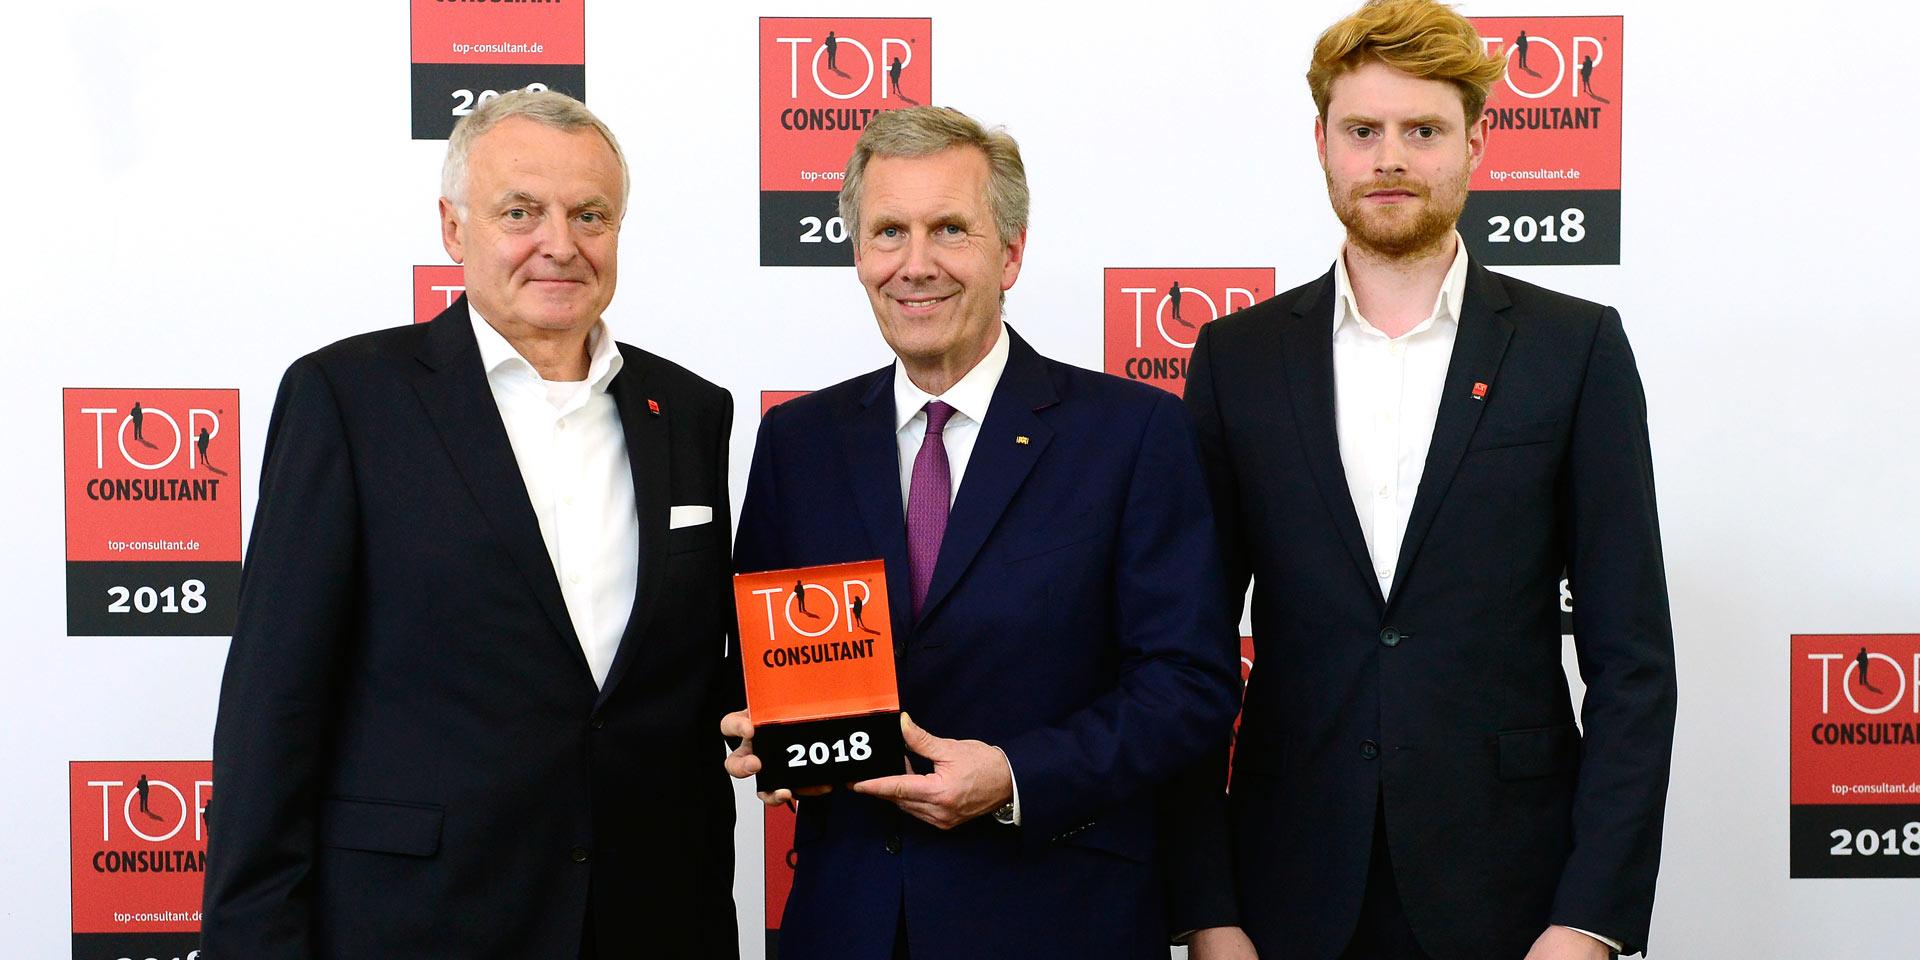 Cordes und Rieger - Top Consultant 2018